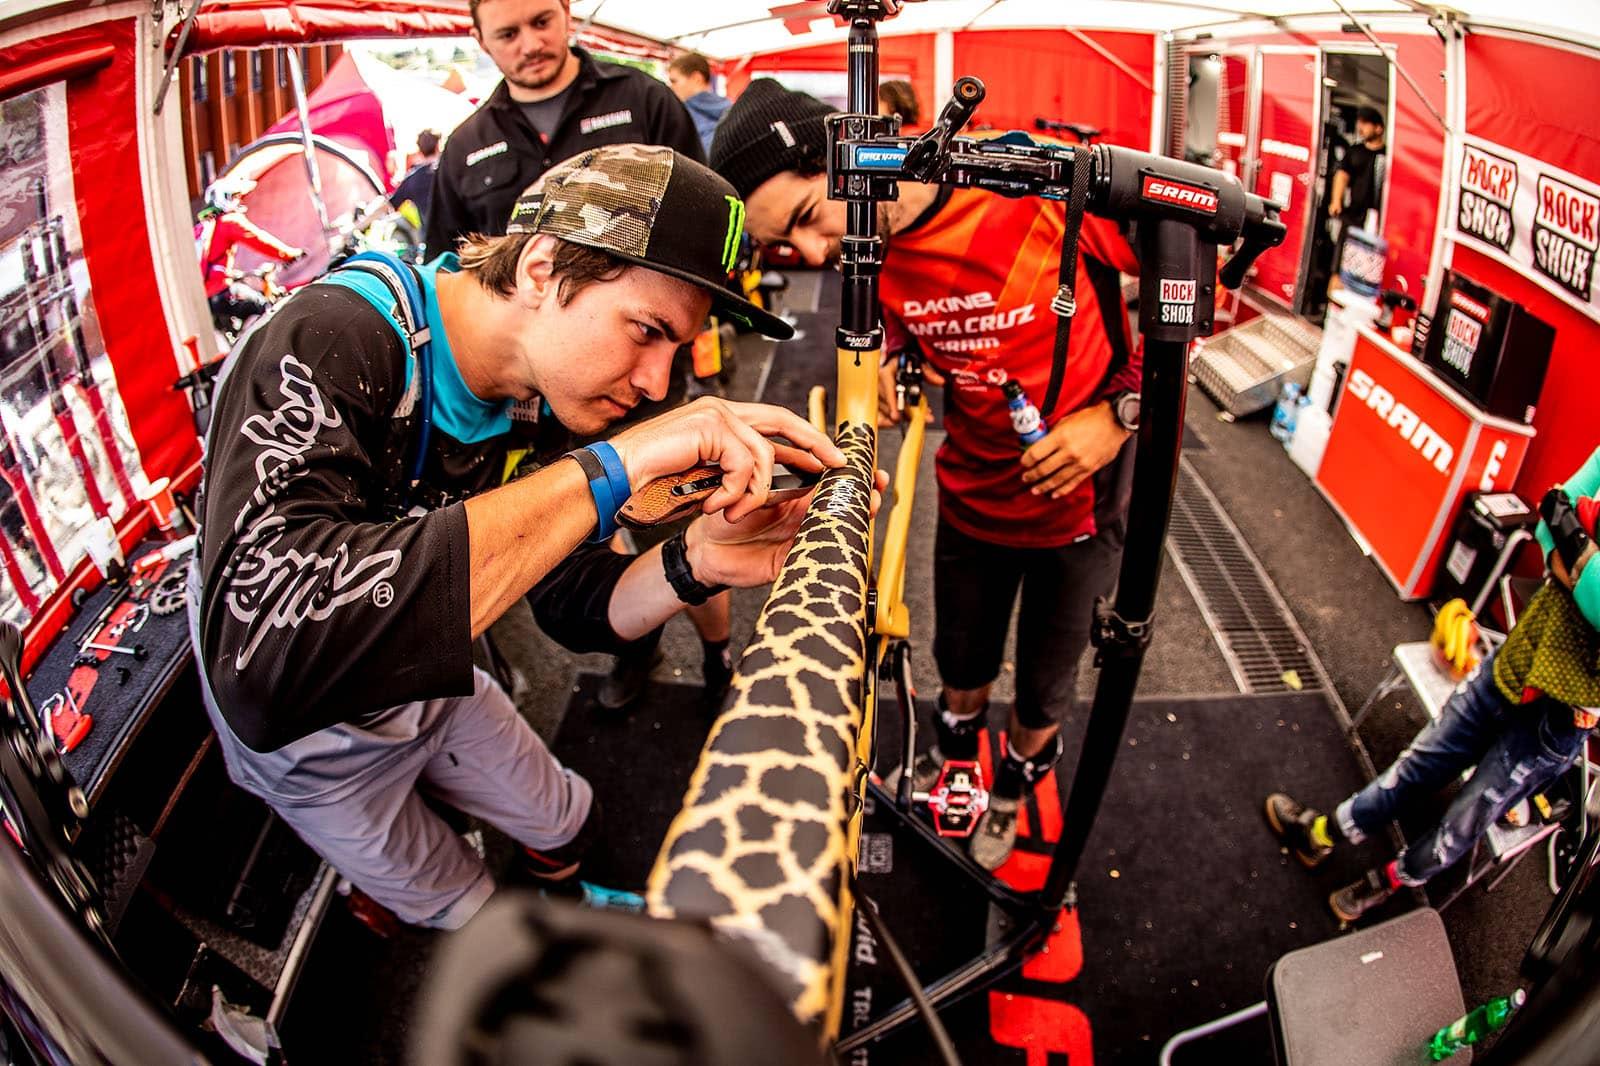 Santa Cruz Bicycles - Cheetah or Giraffe? Mitch and Iago ponder